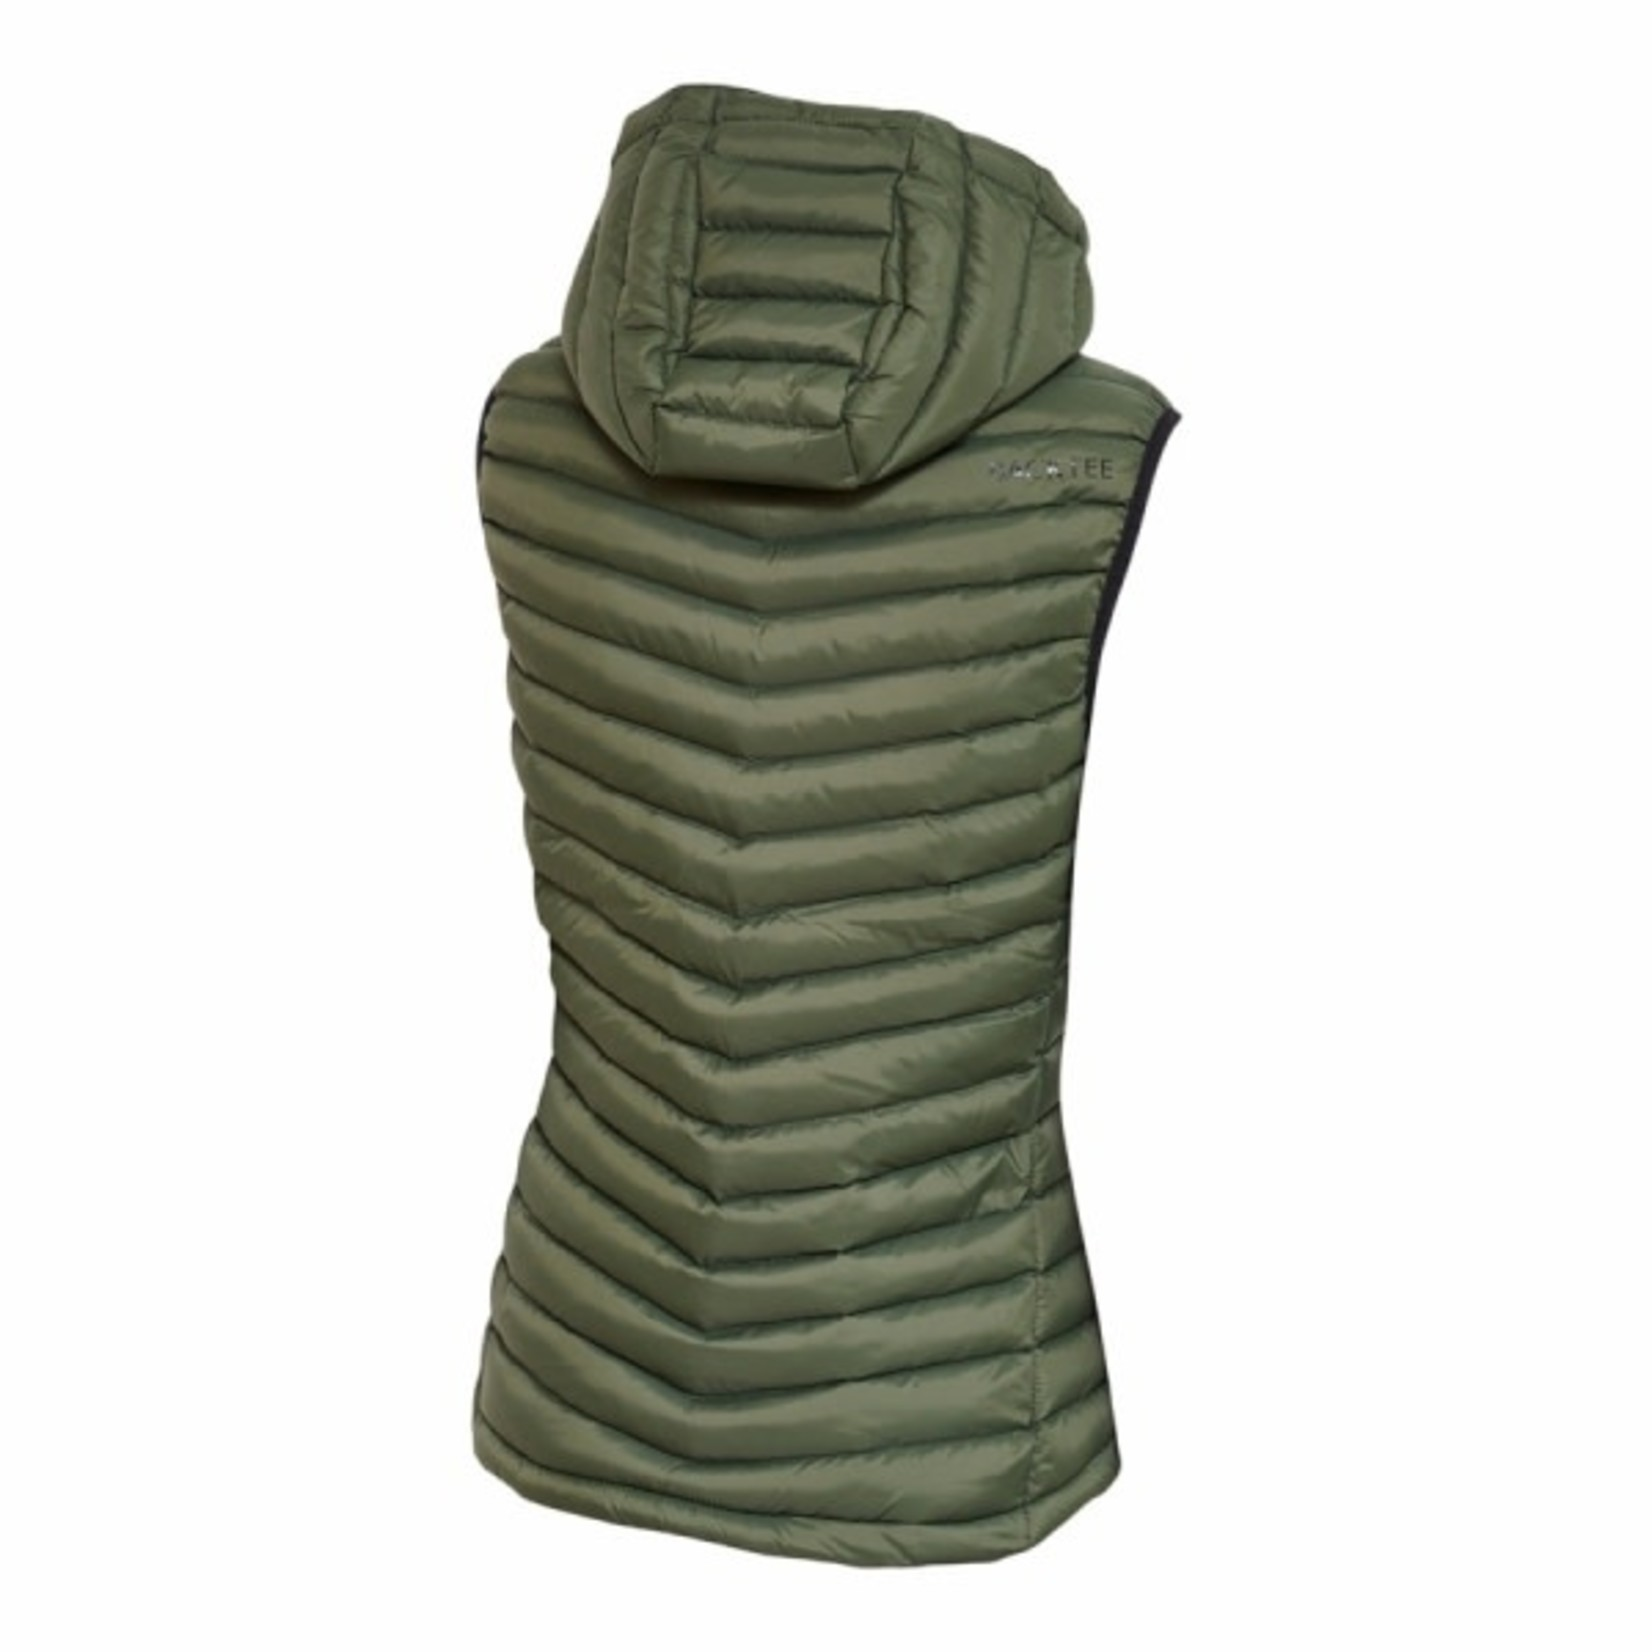 Backtee BackTee Ladies Recycled Panel Bodywarmer / Gilet Beetle (Green)